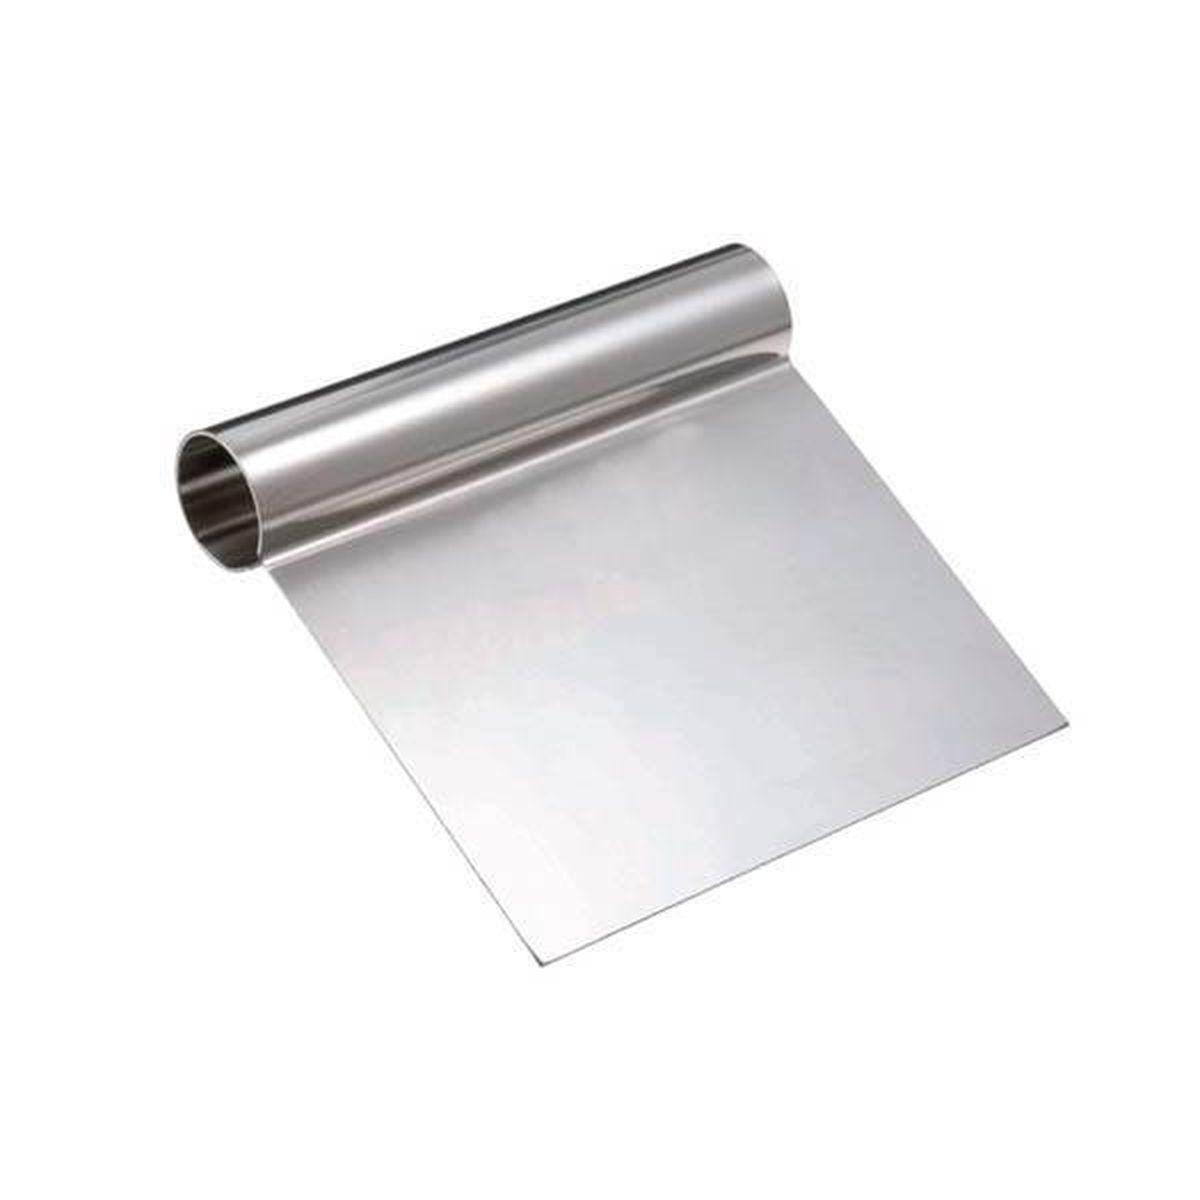 Spatule lisseur en acier 12 x 12.5 cm - Silikomart